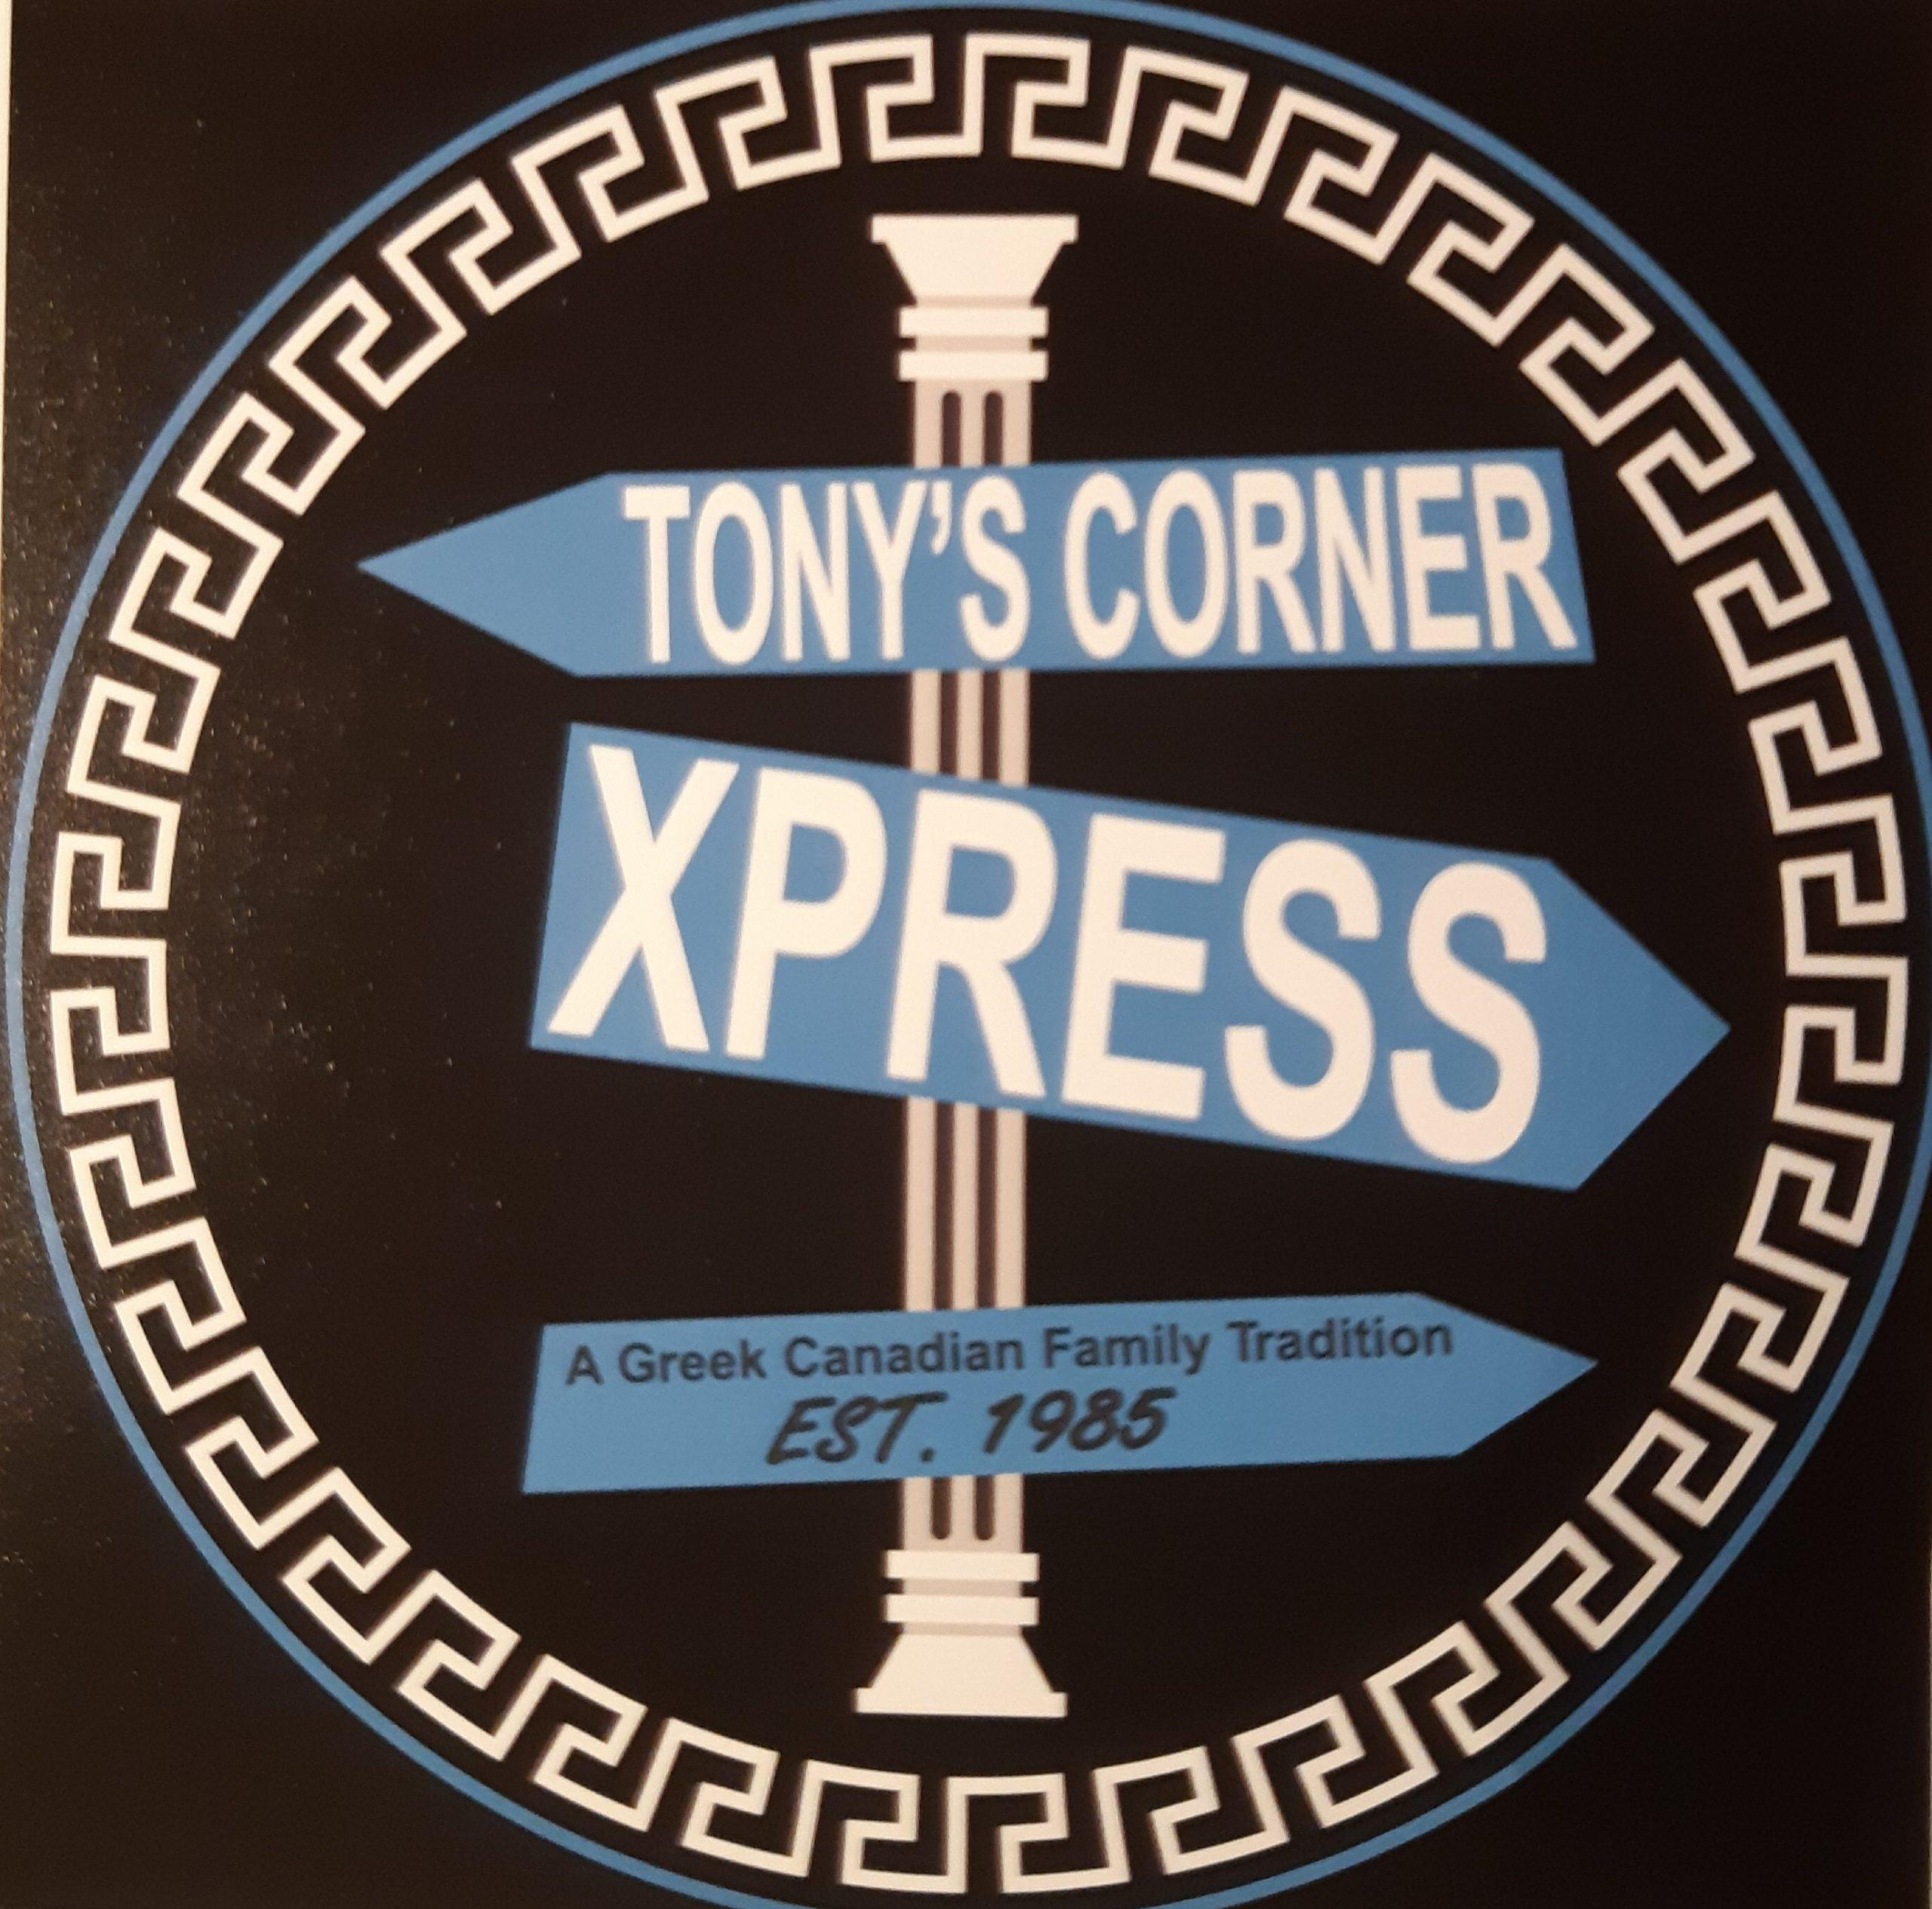 Tony's Corner Xpress